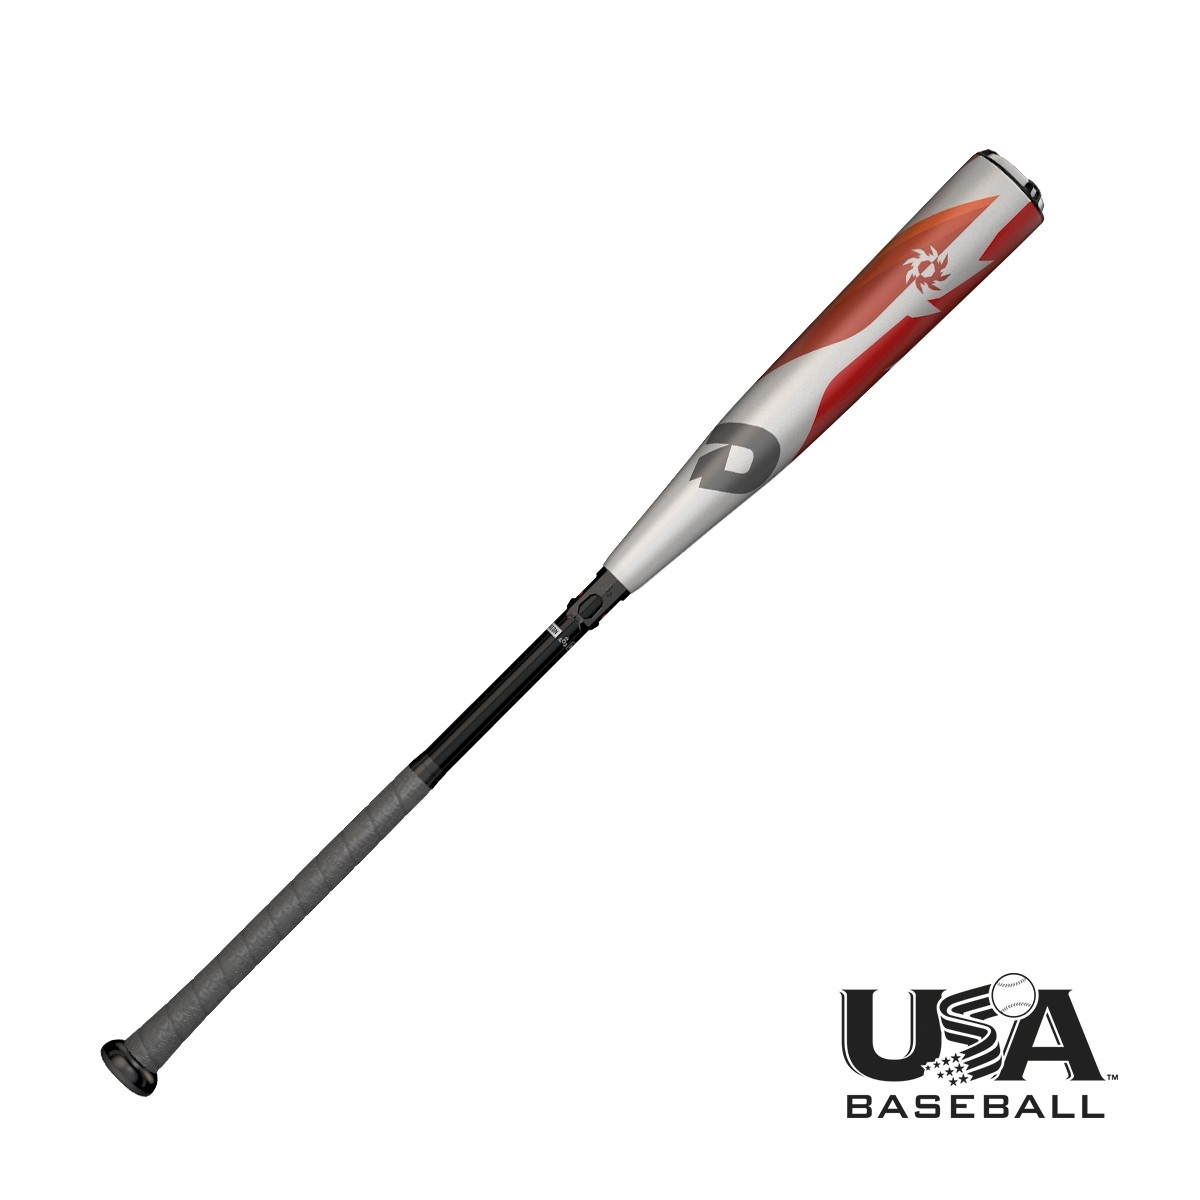 demarini-voodoo-10-2018-usa-balanced-2-5-8-baseball-bat-28-inch-18-oz WTDXUD21828-18 DeMarini 887768610623 Following along with the new USA baseball standards the newest line